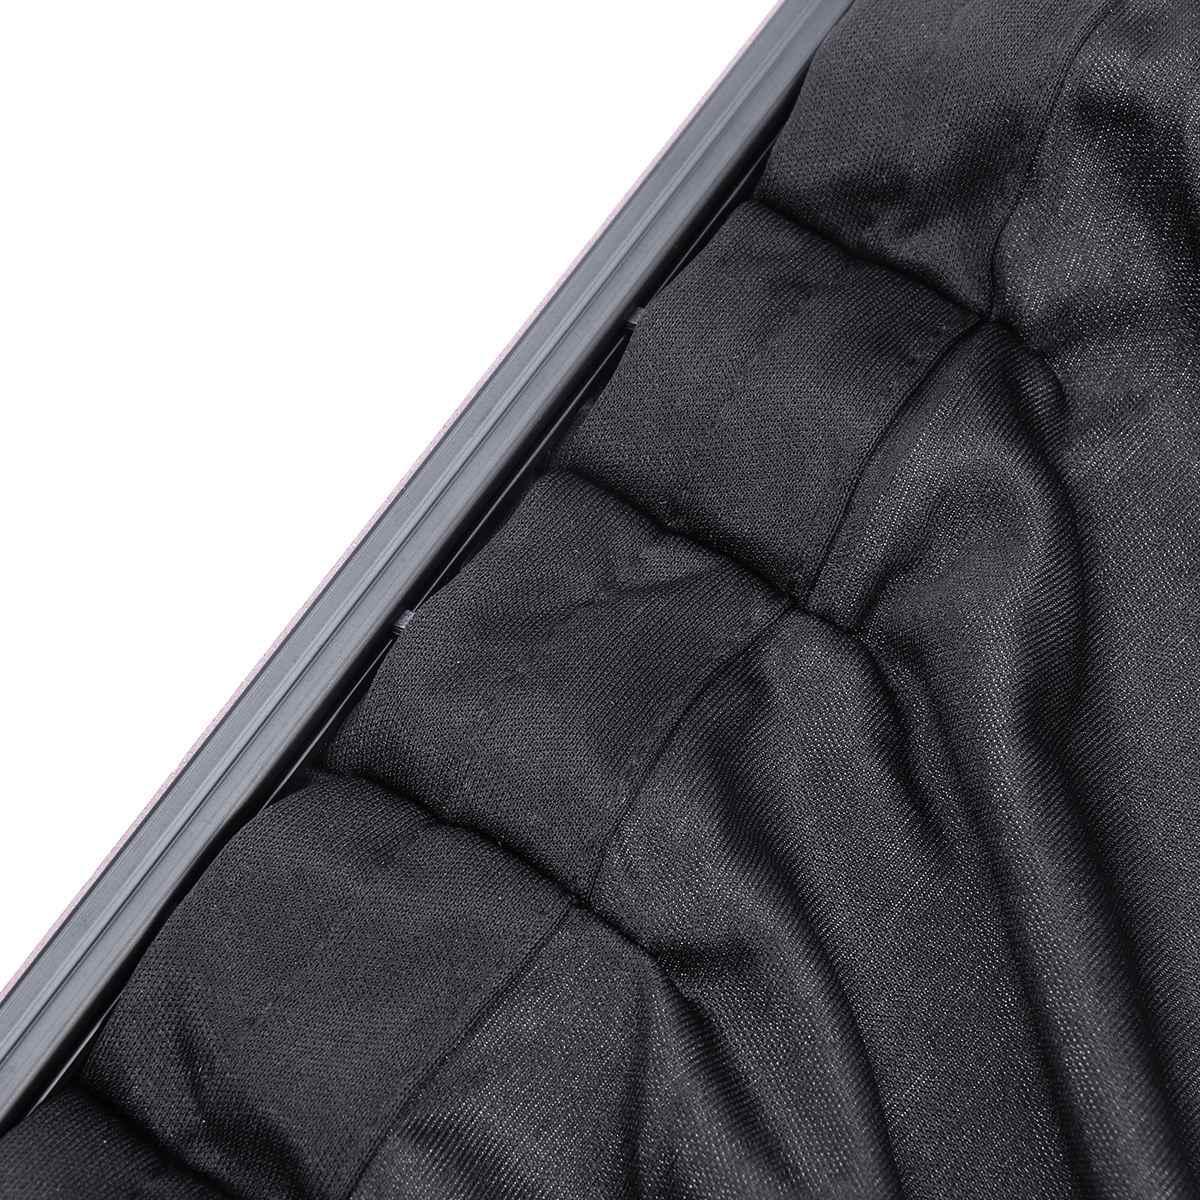 2 pçs cortina de janela lateral do carro escudo da janela do carro malha deslizante cortina de carro anti calor sol protetor uv capa cortinas coche pára-sol